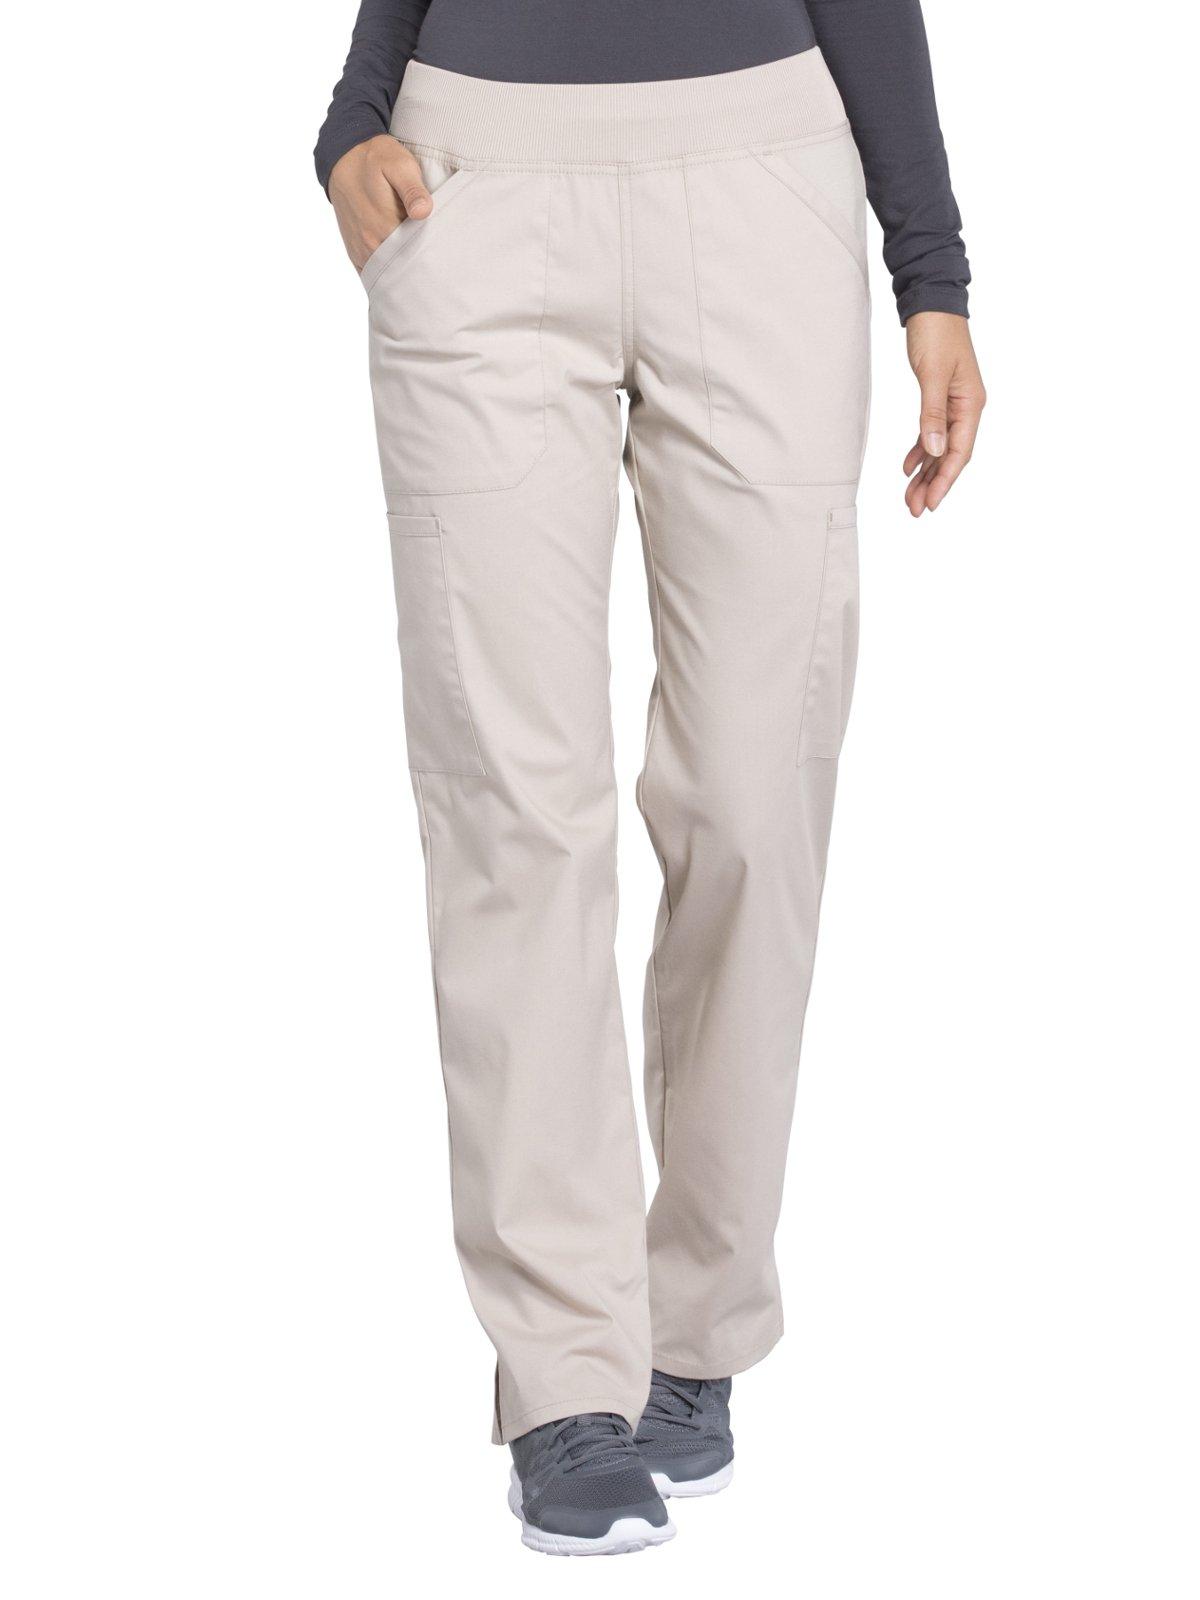 Cherokee Professionals by Workwear Women's Elastic Waistband Pull On Cargo Scrub Pant Large Khaki